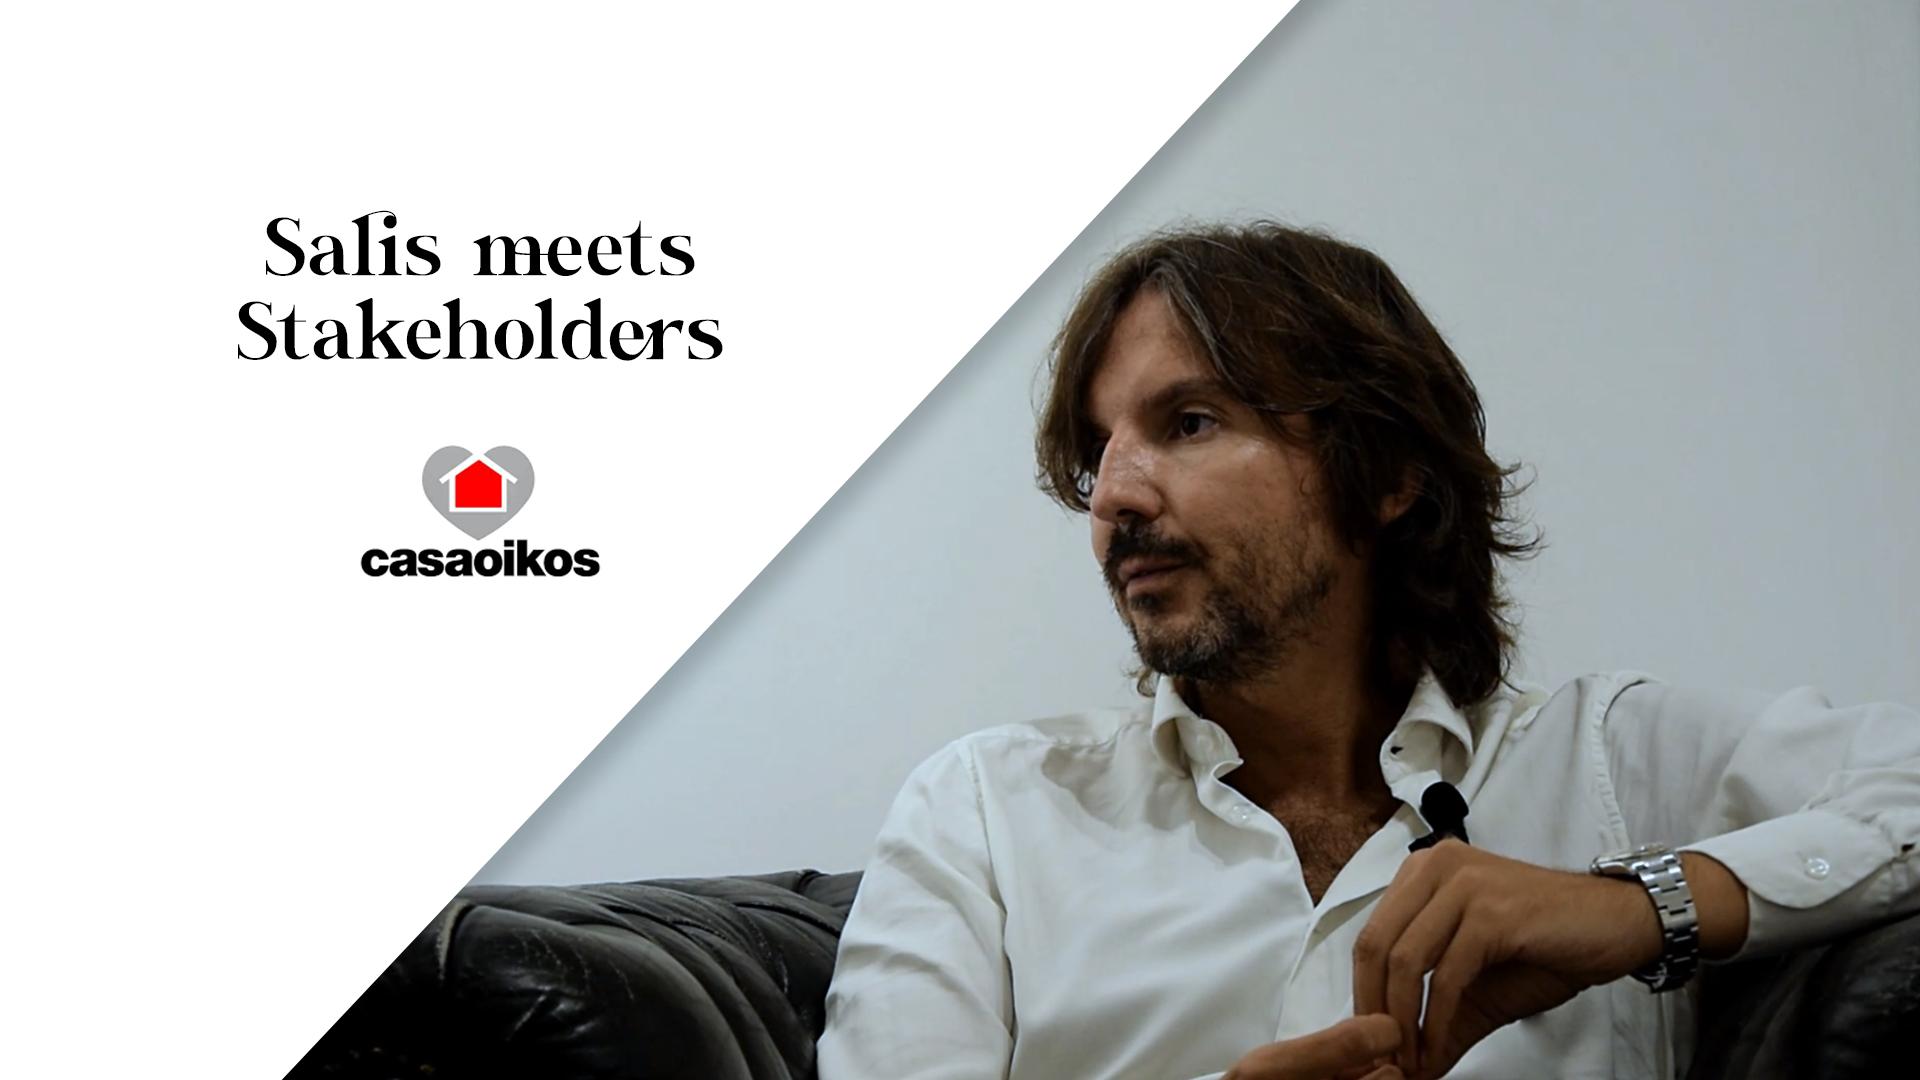 Salis meets Stakeholders: Luca Berardo